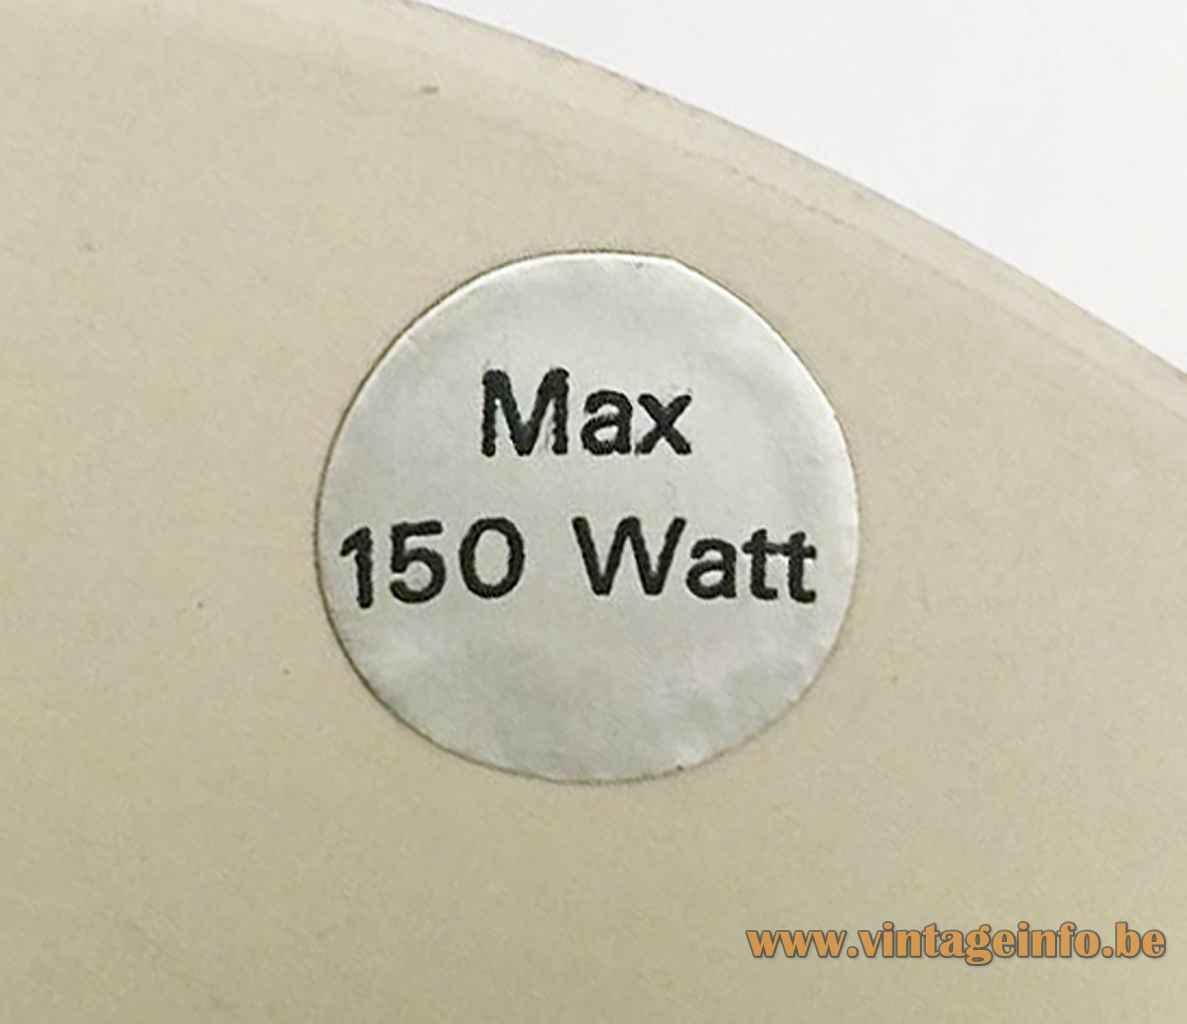 Bent Nordsted Lyskaer pendant lamp round paper label Max 150 Watt 1970s Denmark Lyskaer Belysning